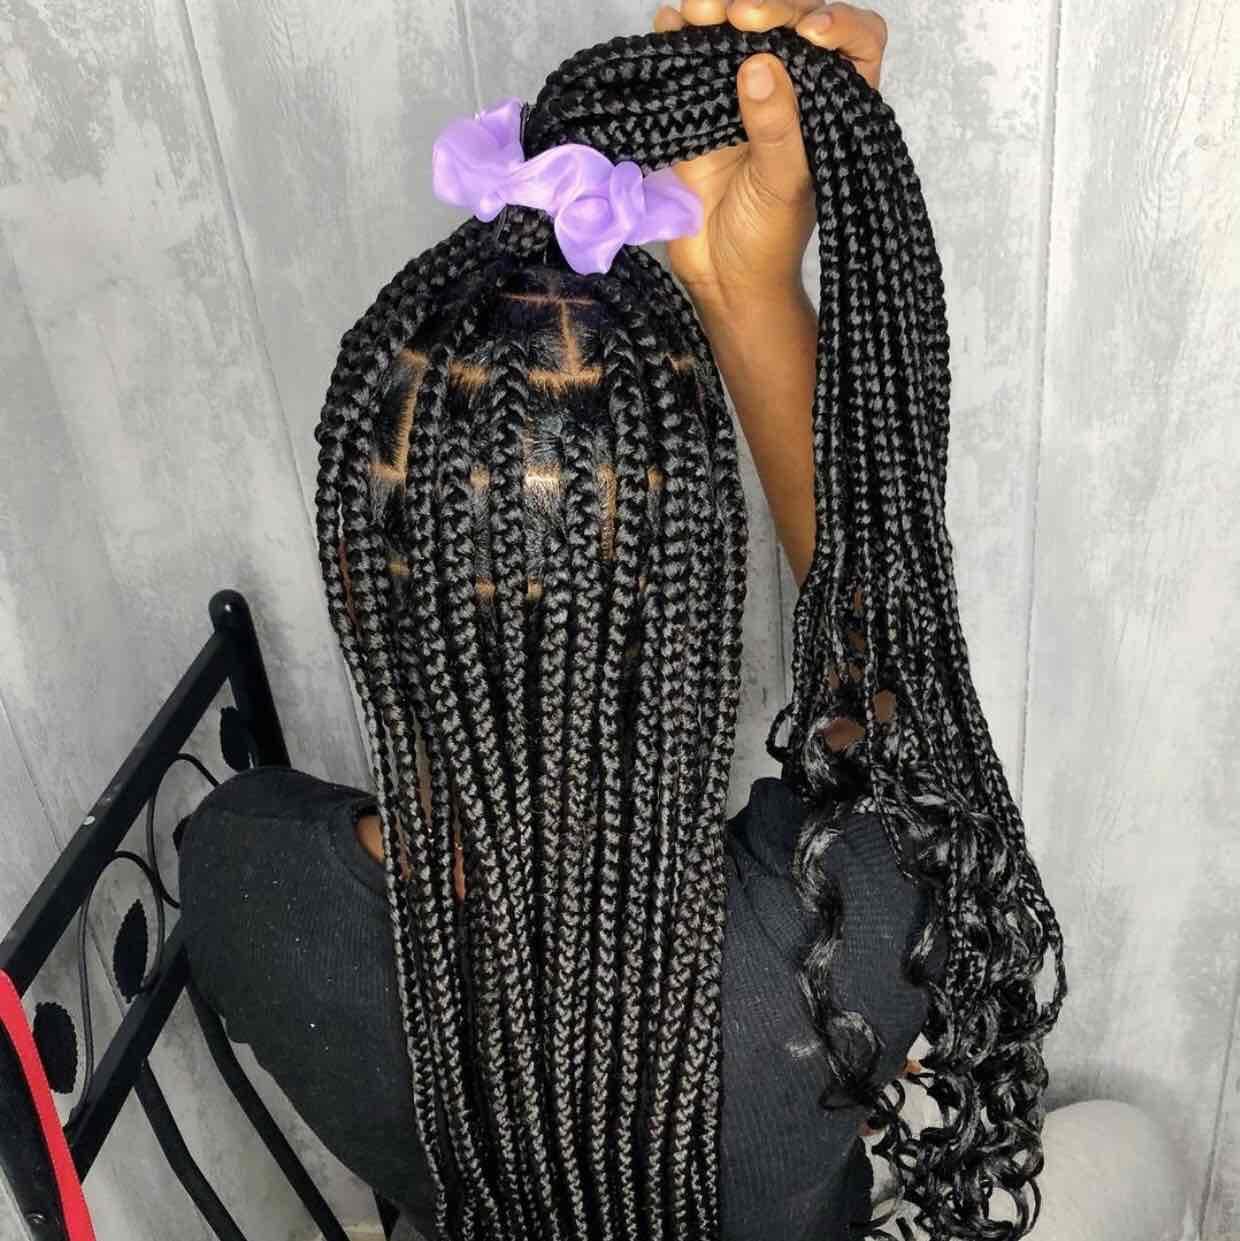 salon de coiffure afro tresse tresses box braids crochet braids vanilles tissages paris 75 77 78 91 92 93 94 95 HIIXJBFG